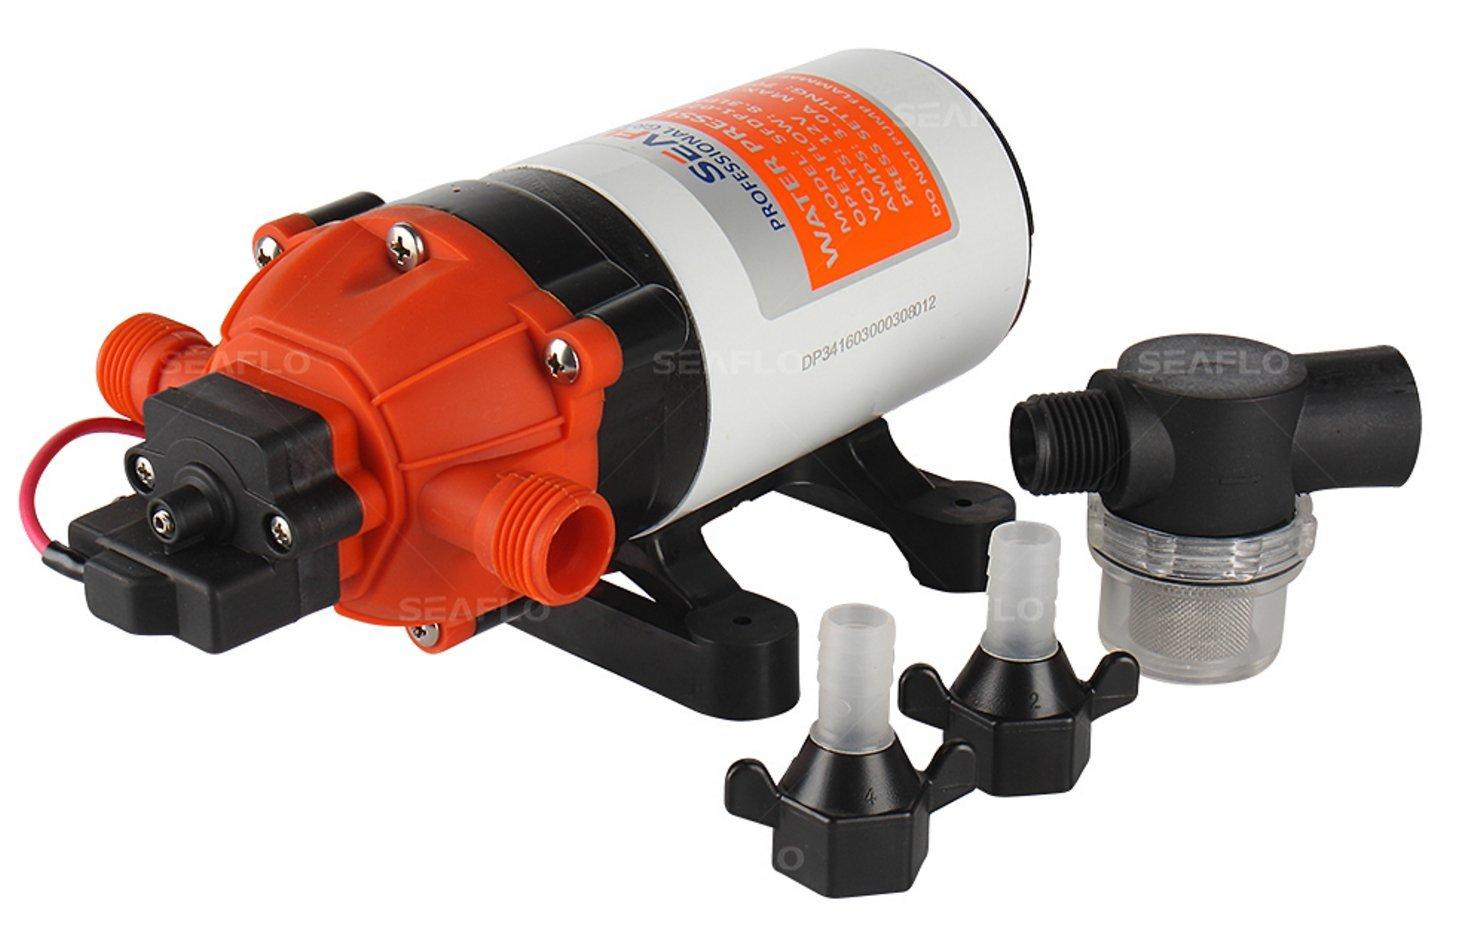 SEAFLO 12V 1.6 GPM 100 PSI 34-Series Water Pressure Diaphragm Pump by Seaflo (Image #2)